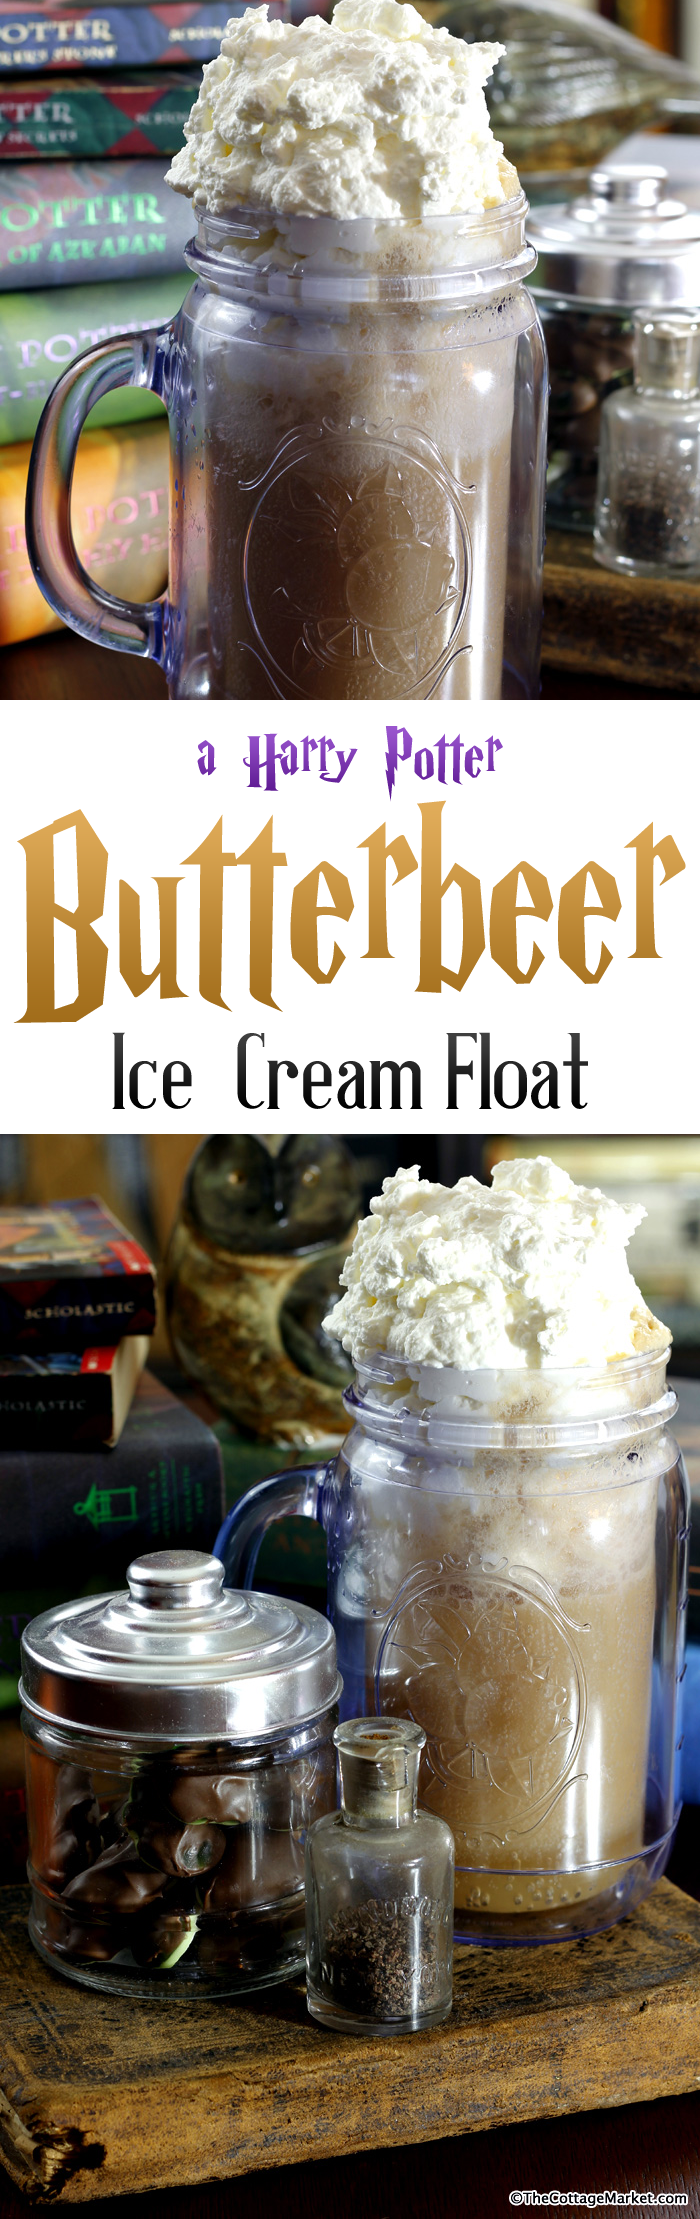 Homemade Harry Potter Butterbeer Ice Cream Float Recipe